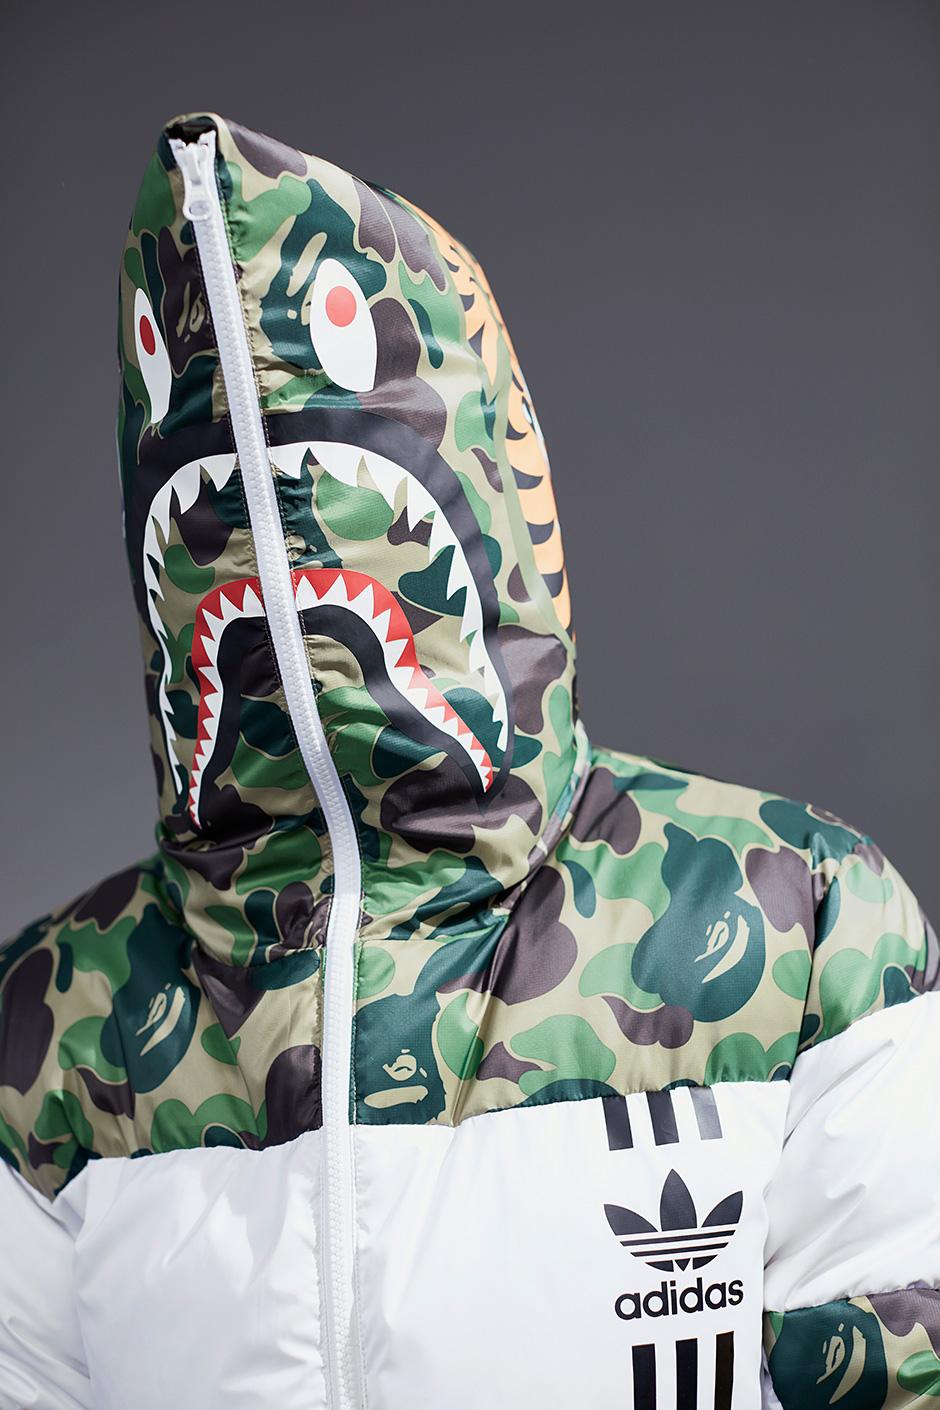 adidas Originals by BAPE FallWinter 2016 Collection